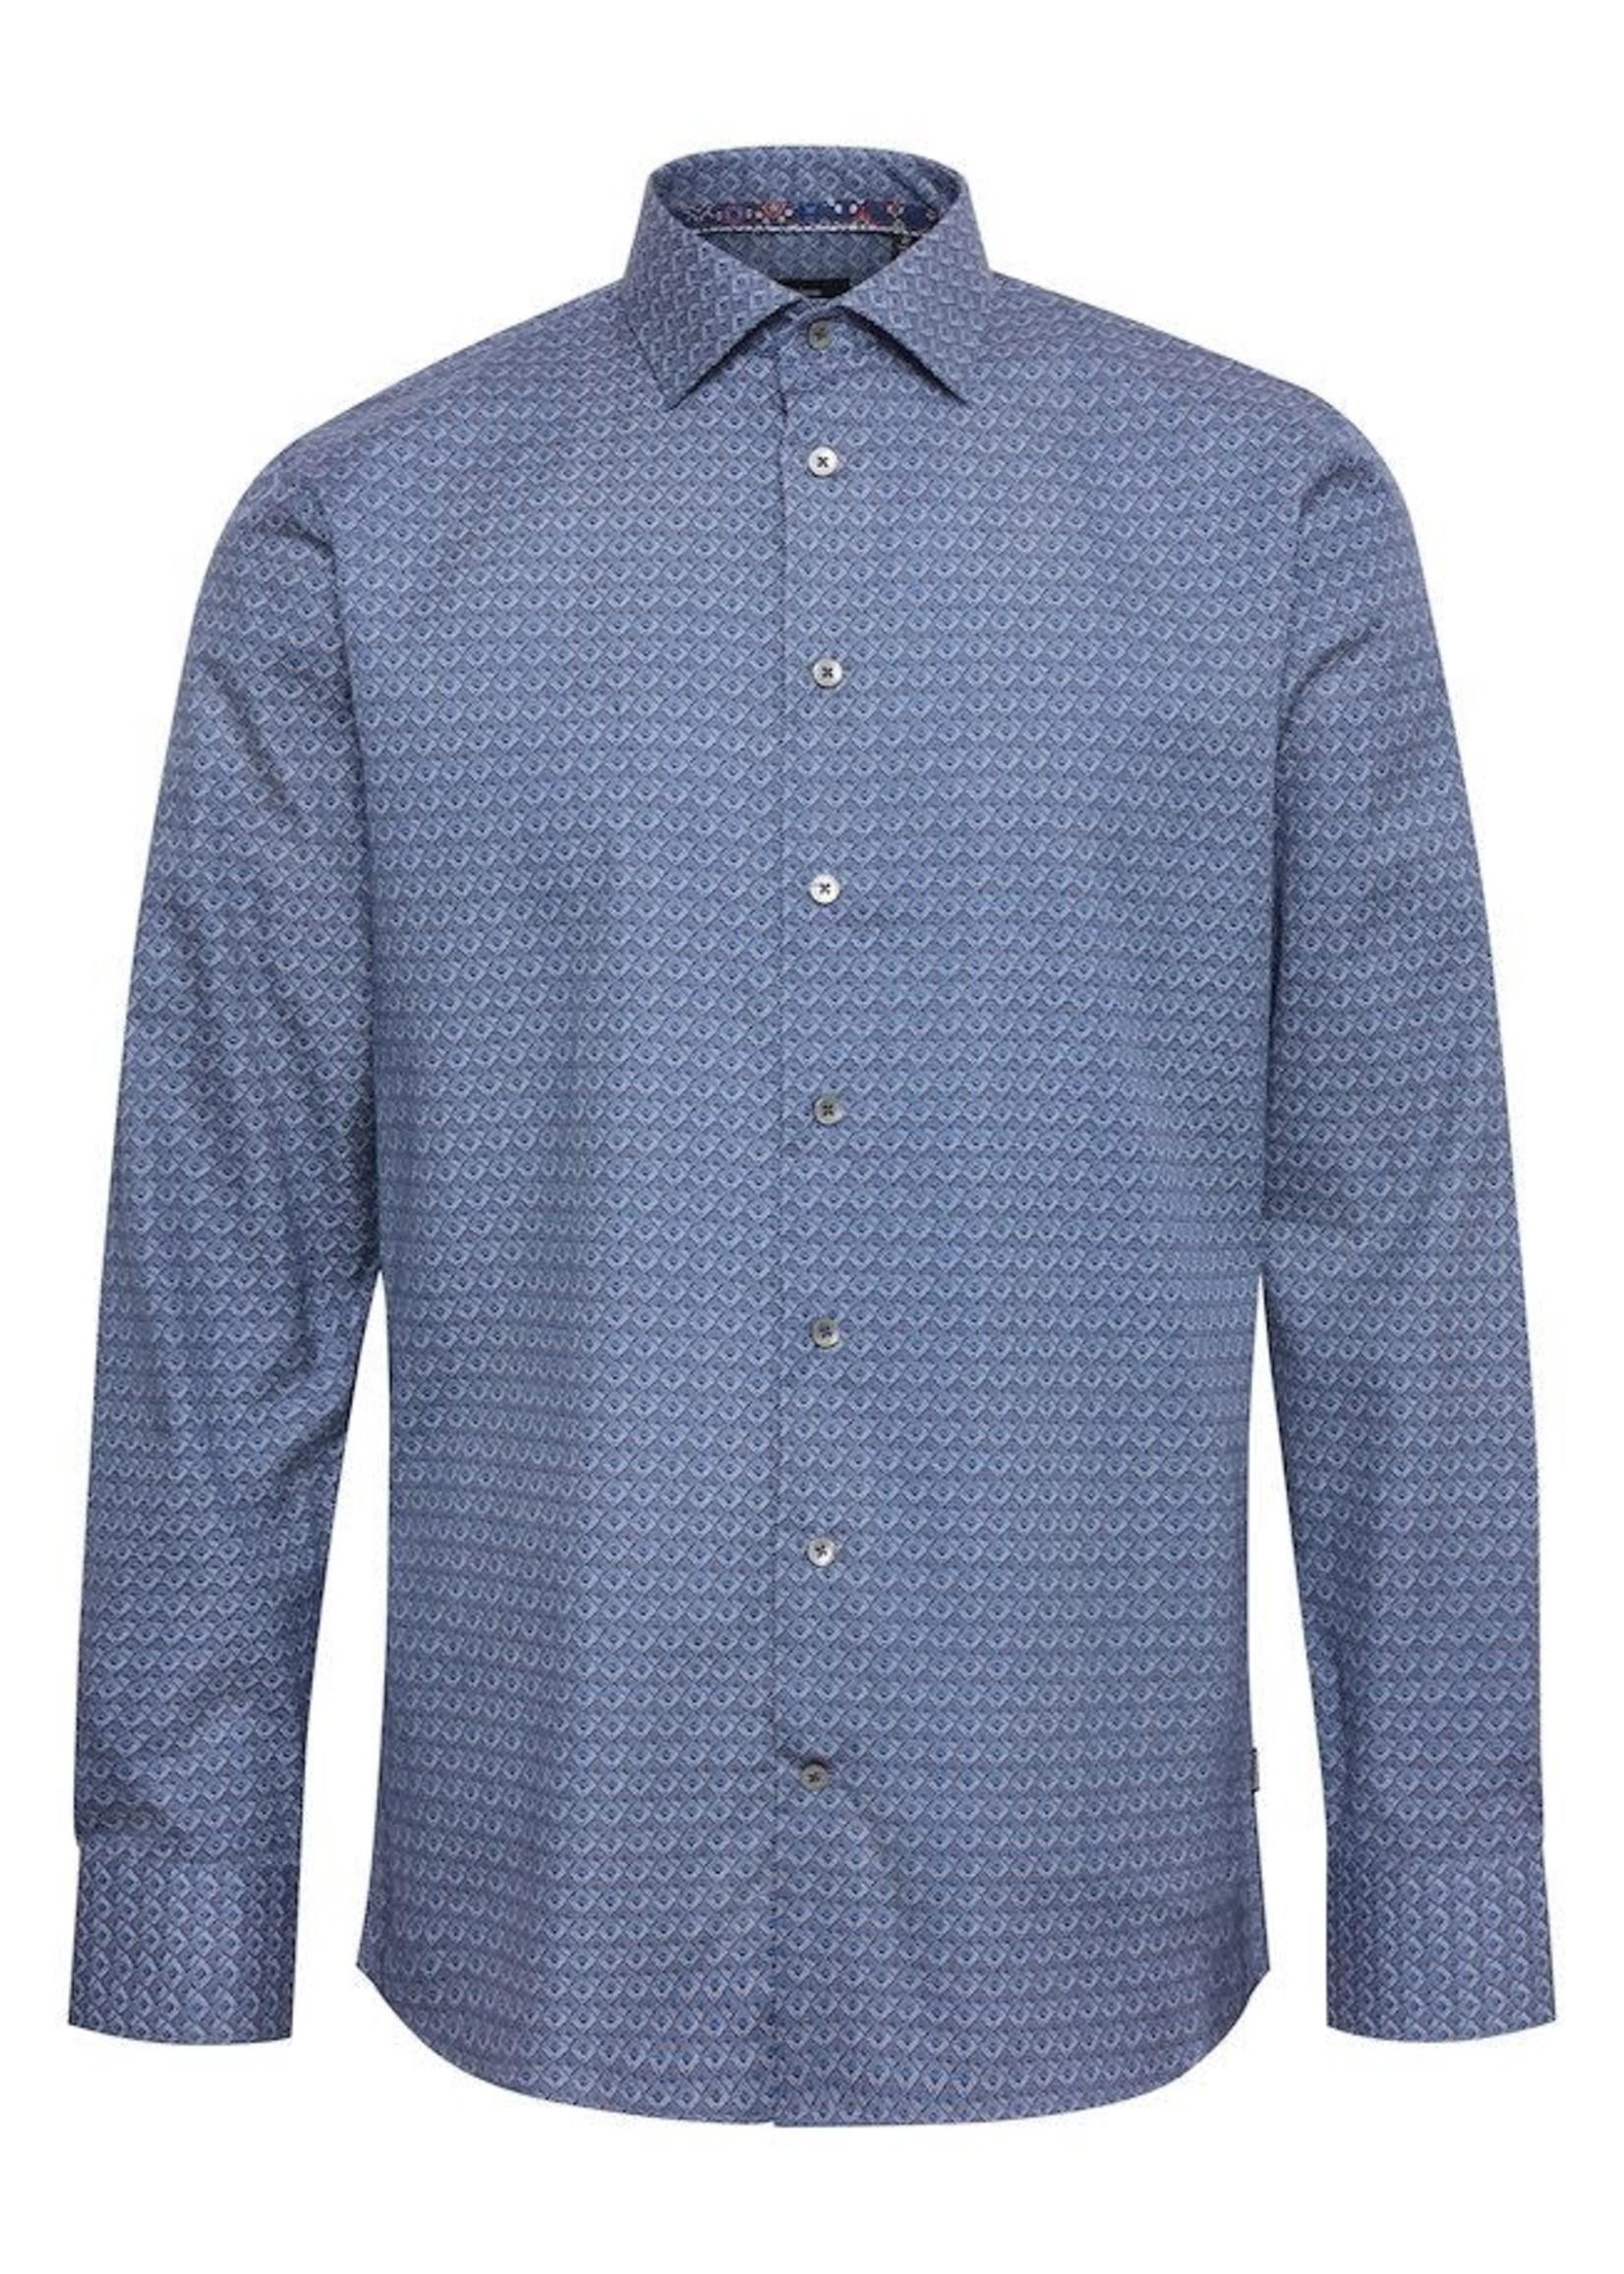 Matinique 30204540 Matinique Dress shirt